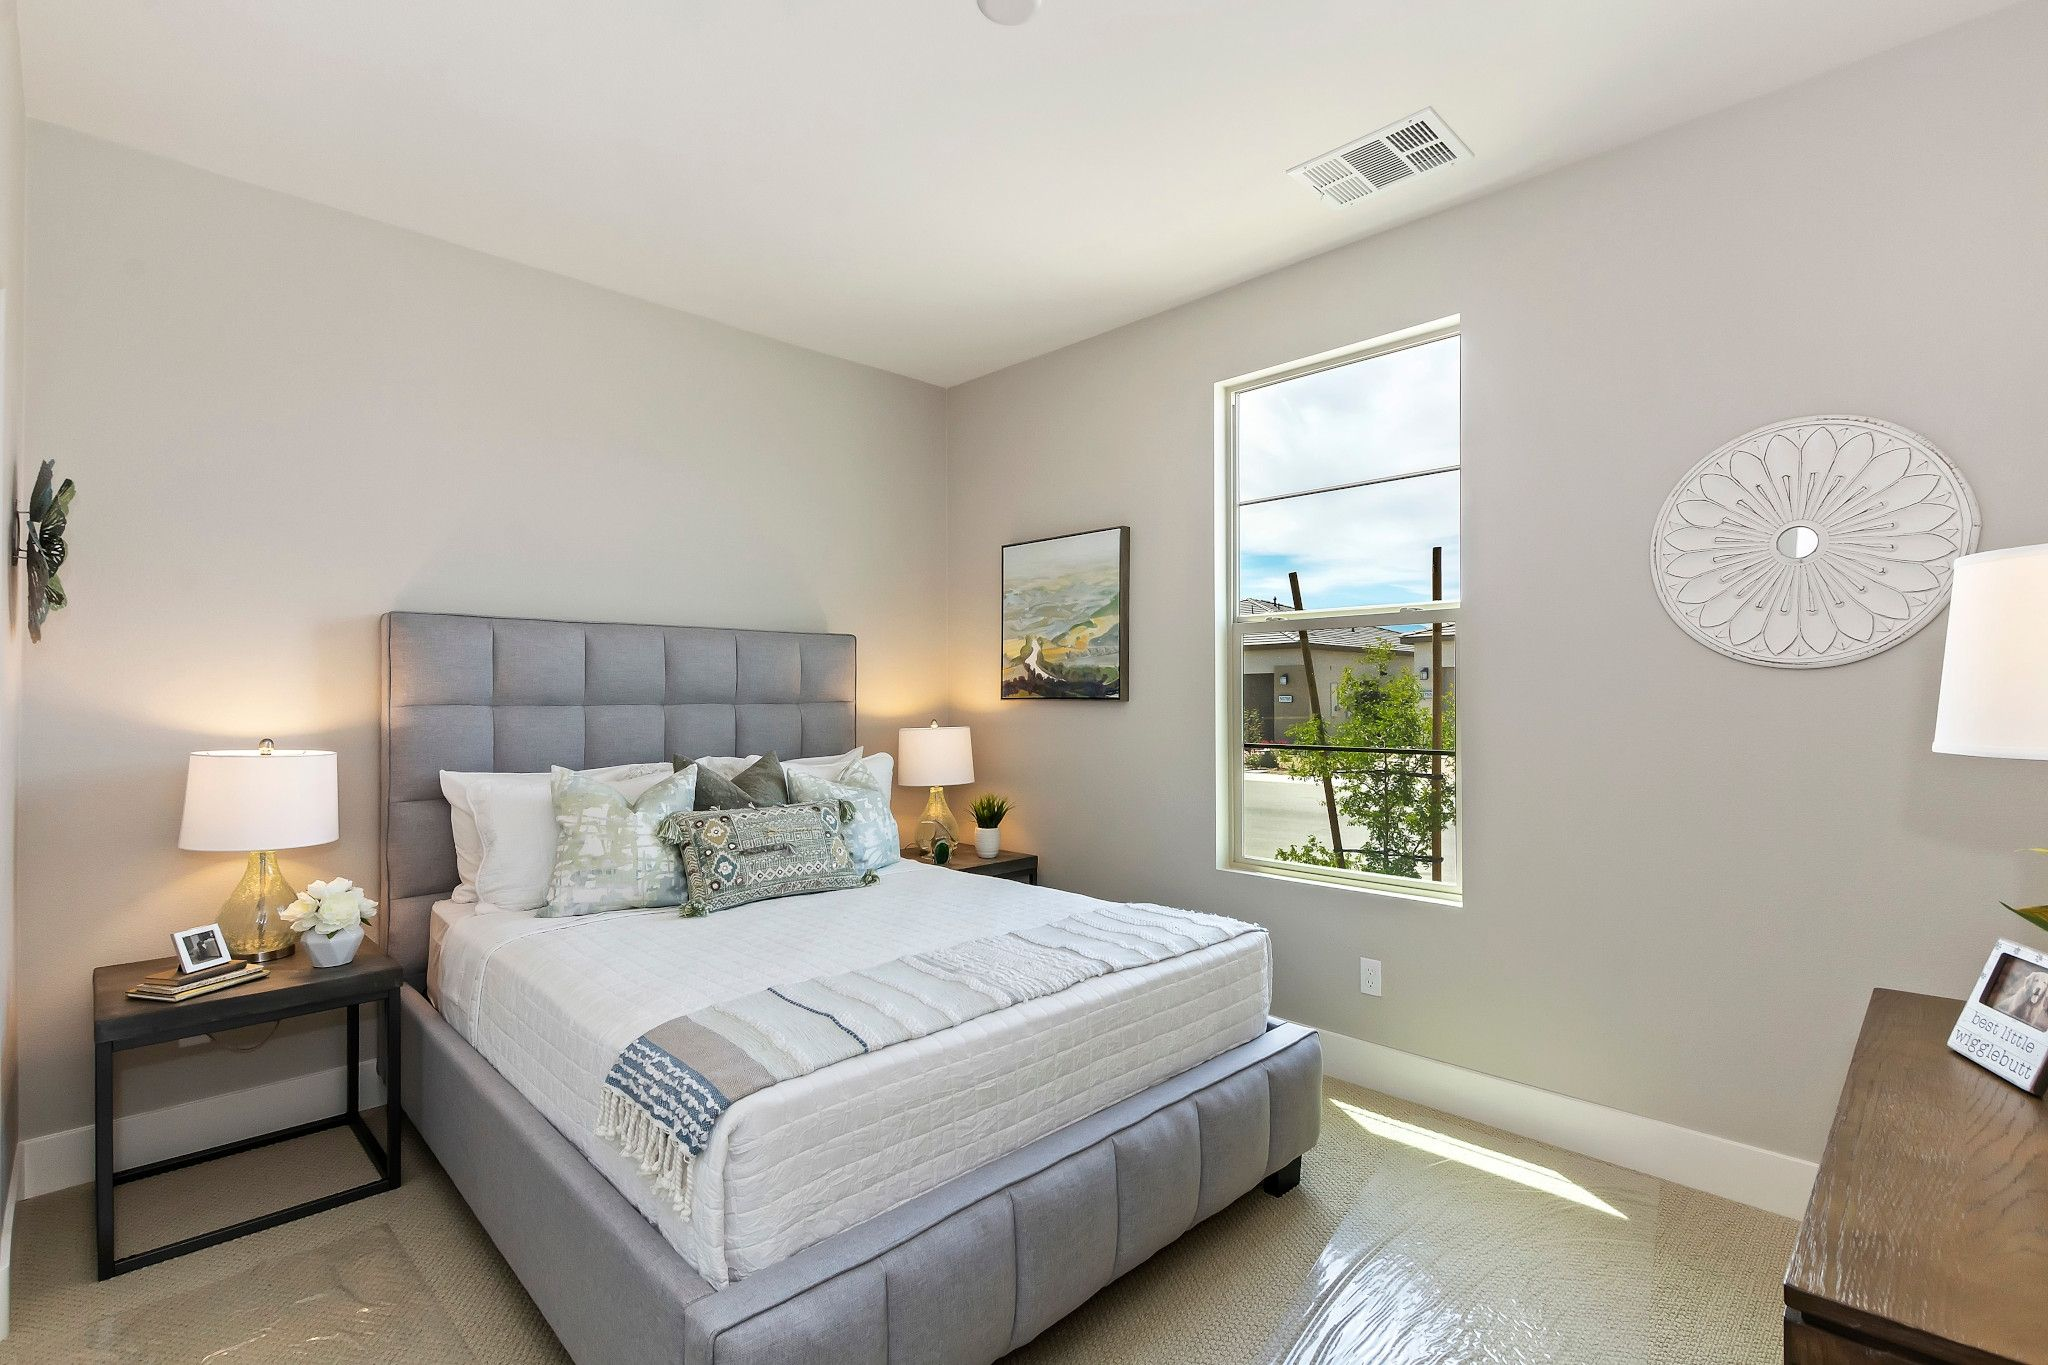 Trilogy Polo Club Unite Guest Bedroom: Unite Guest Bedroom